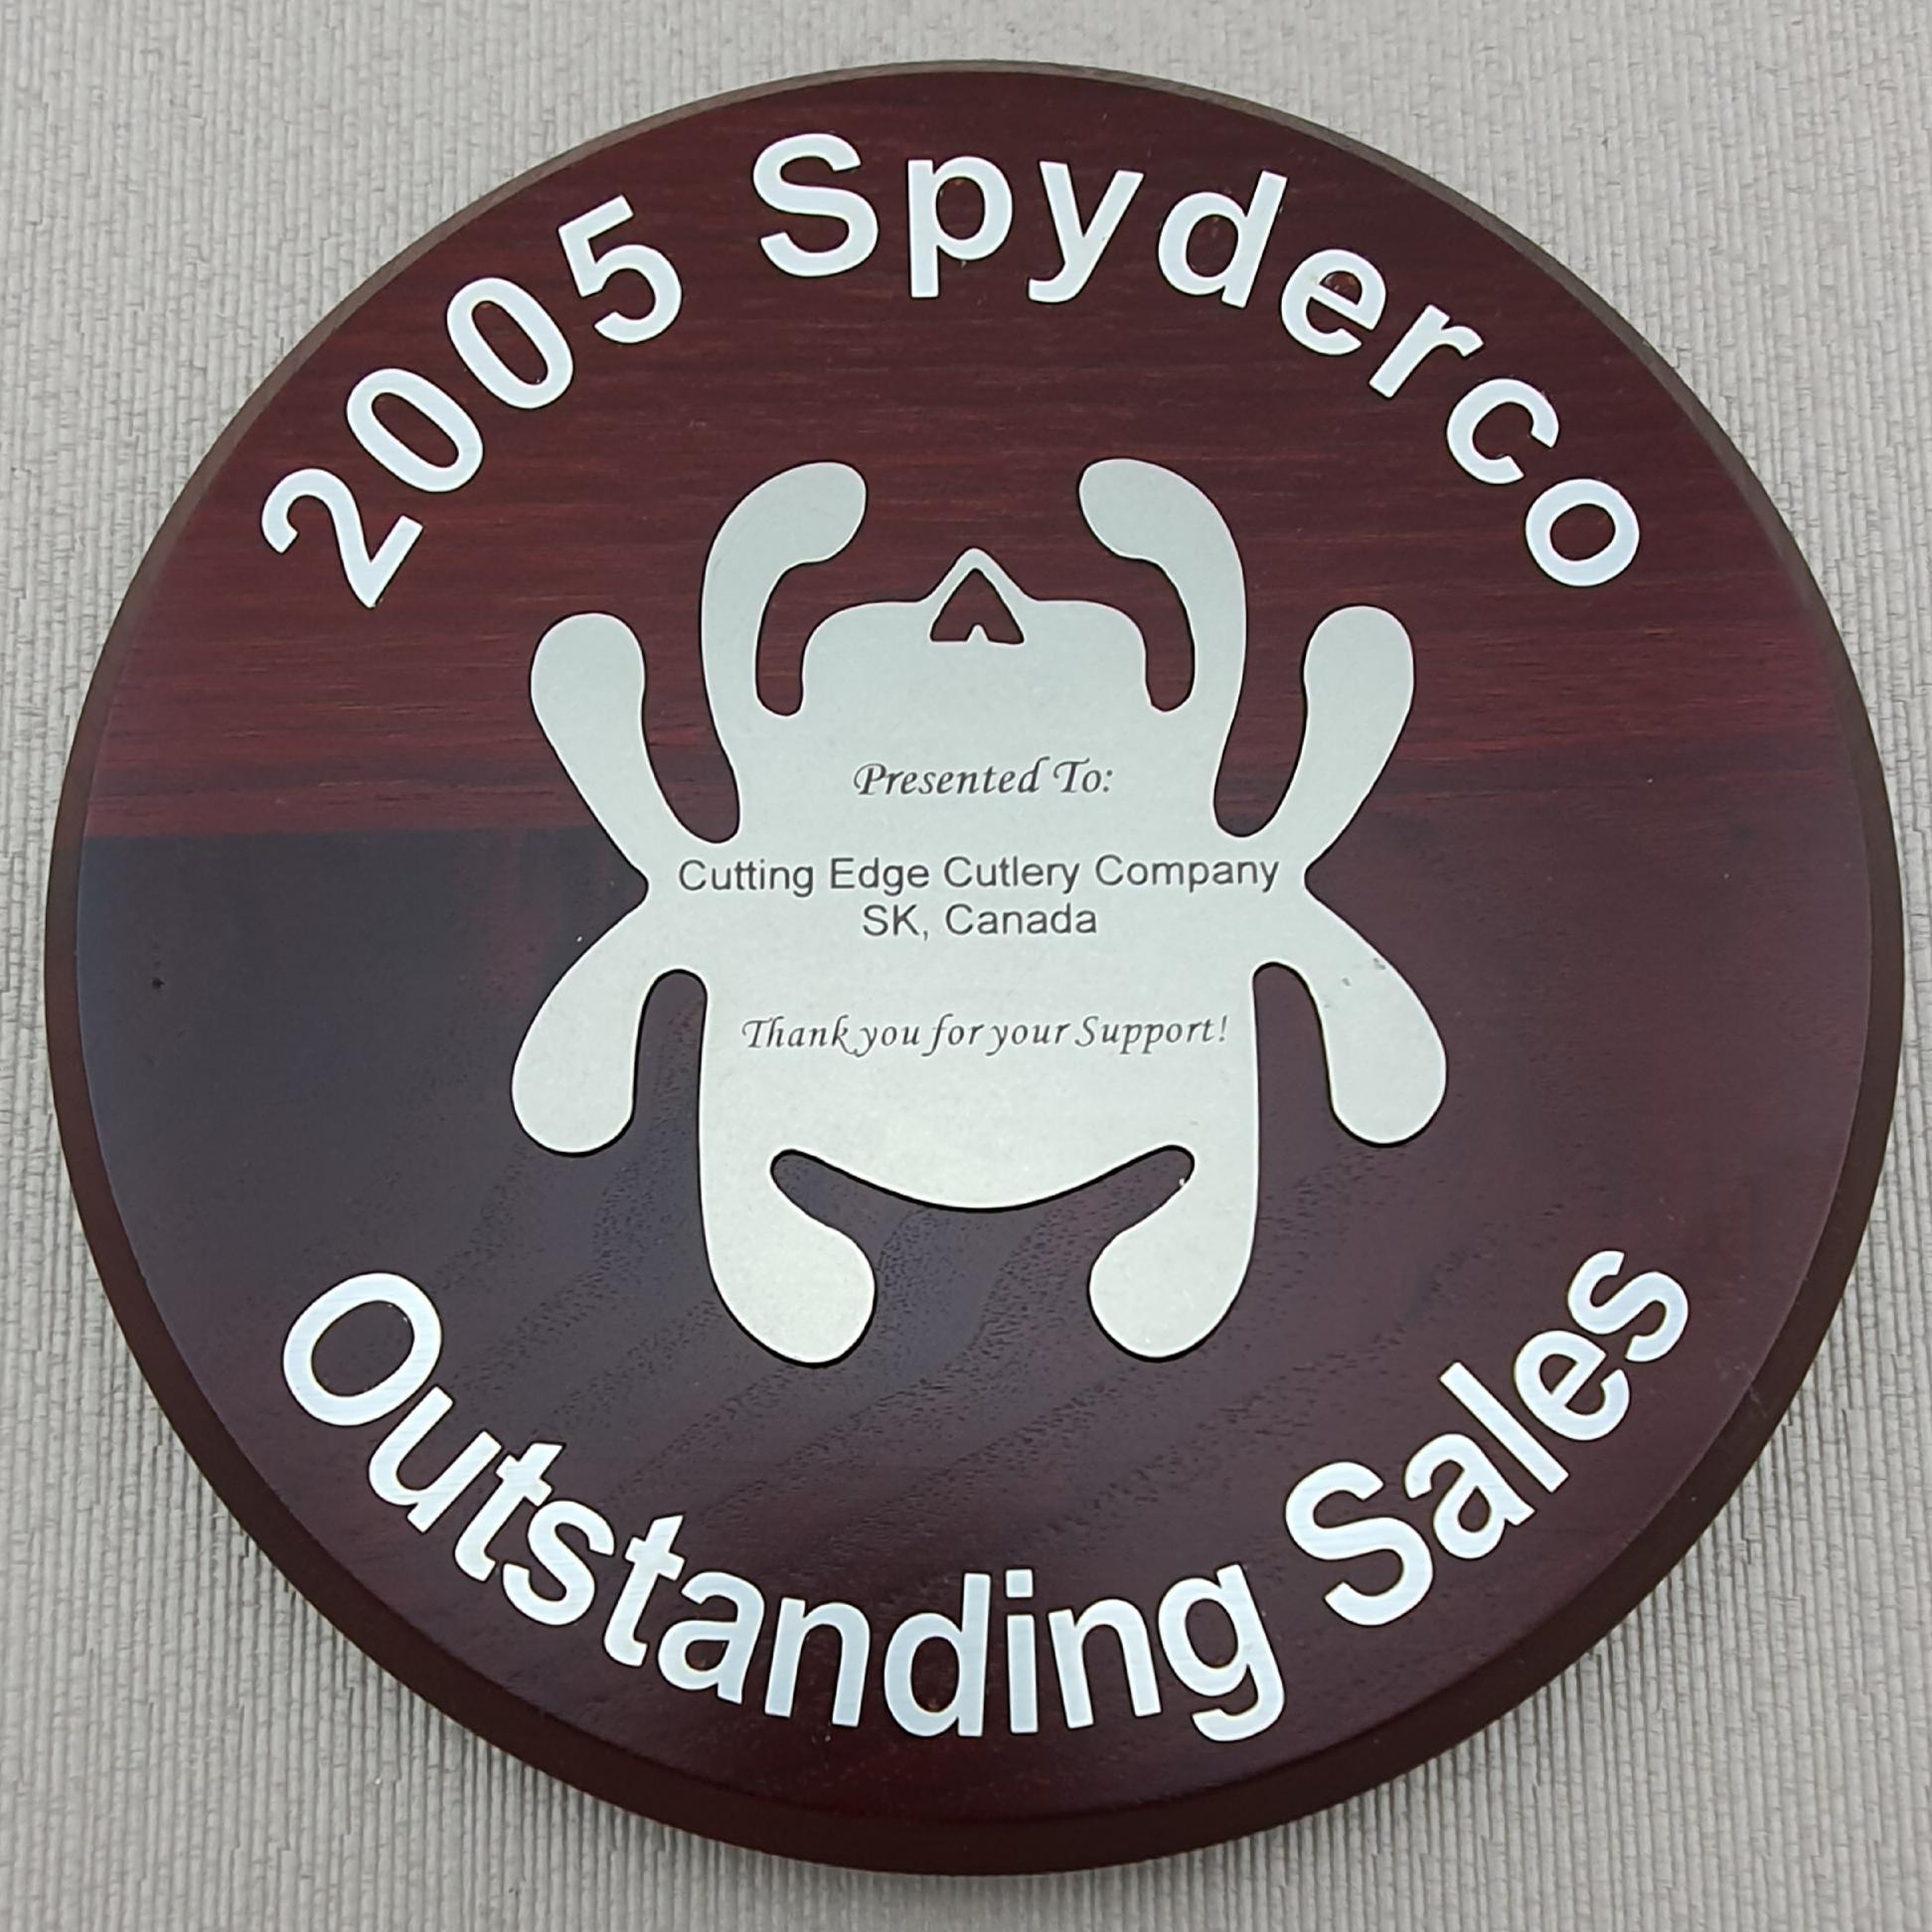 Spyderco award 2005